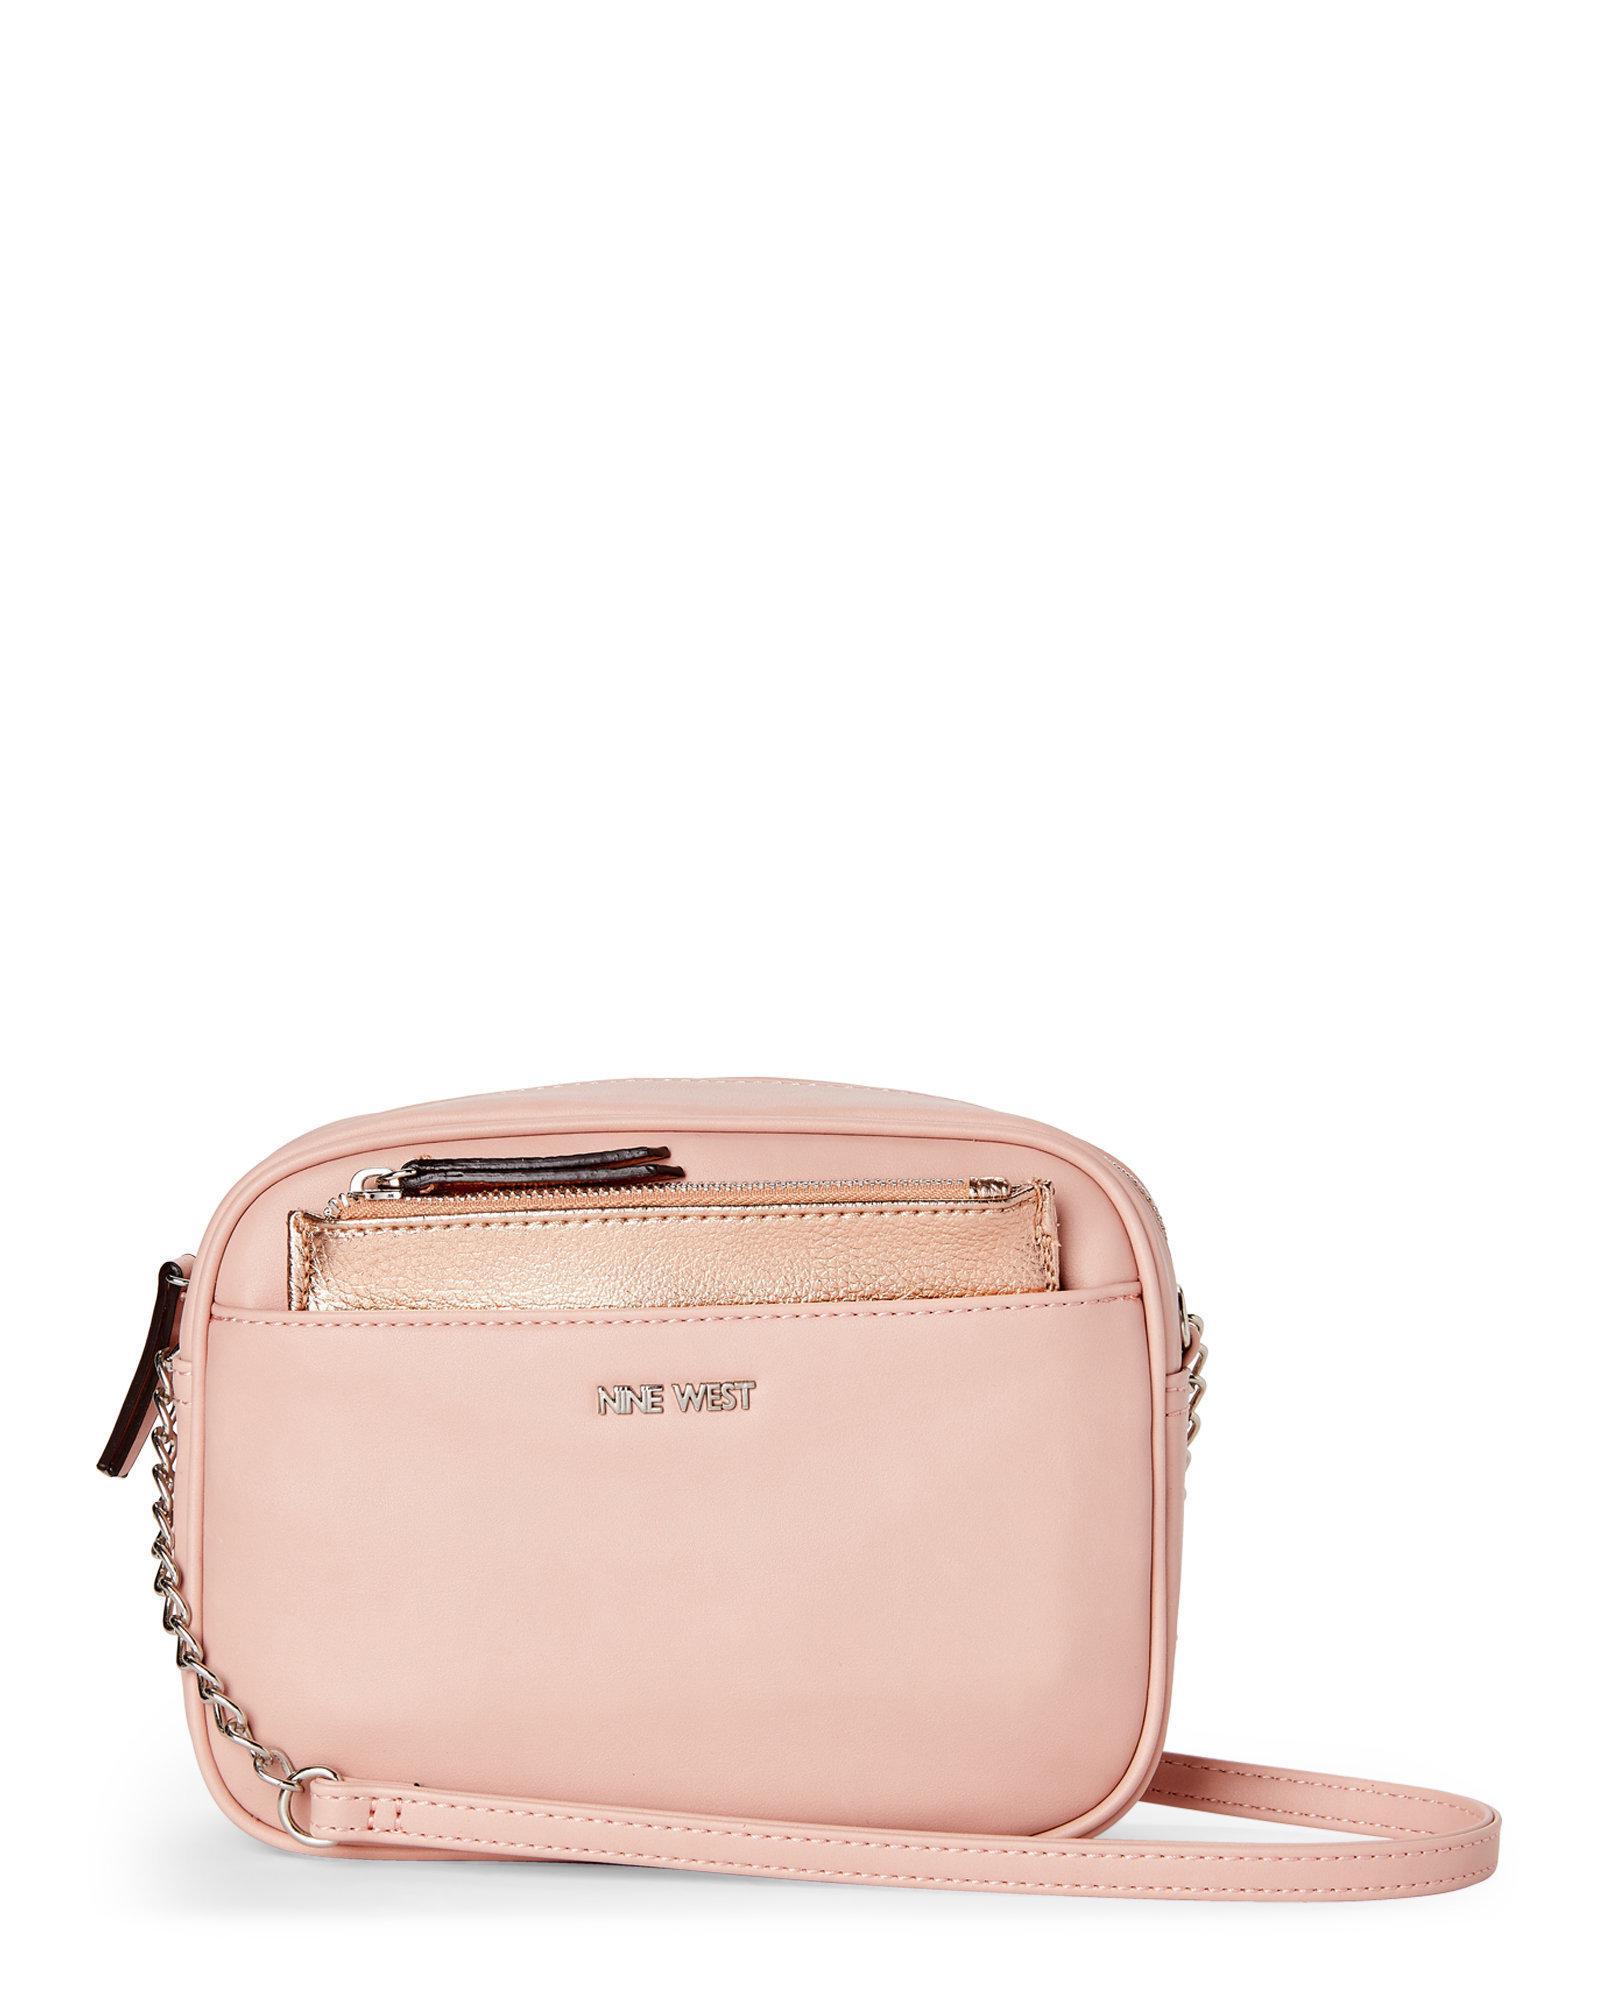 e3628d7dfd76 Lyst - Nine West Pretty Pink   Rose Gold Lyndsie Crossbody in Pink